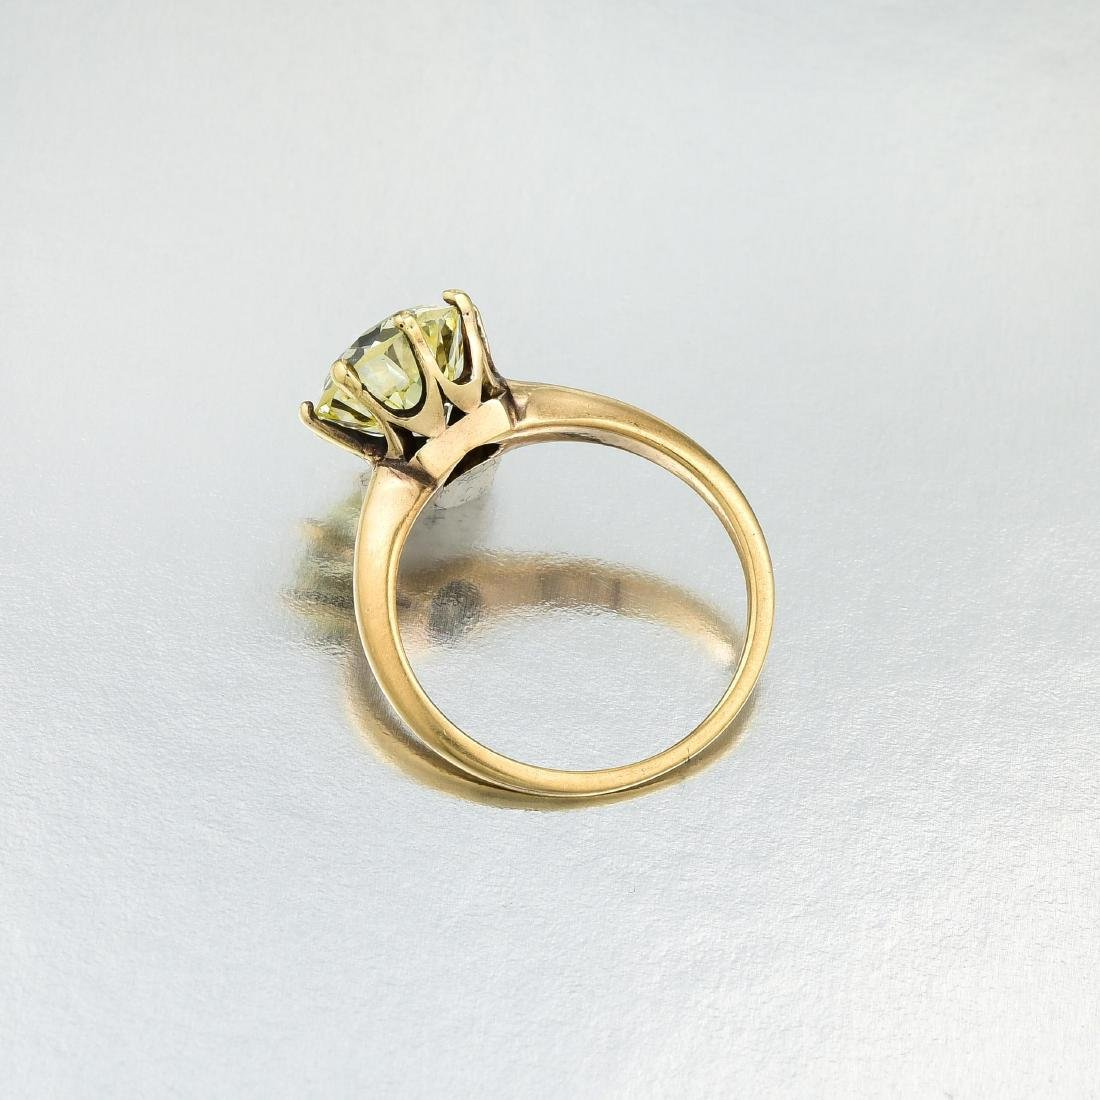 Antique Diamond Ring - 3